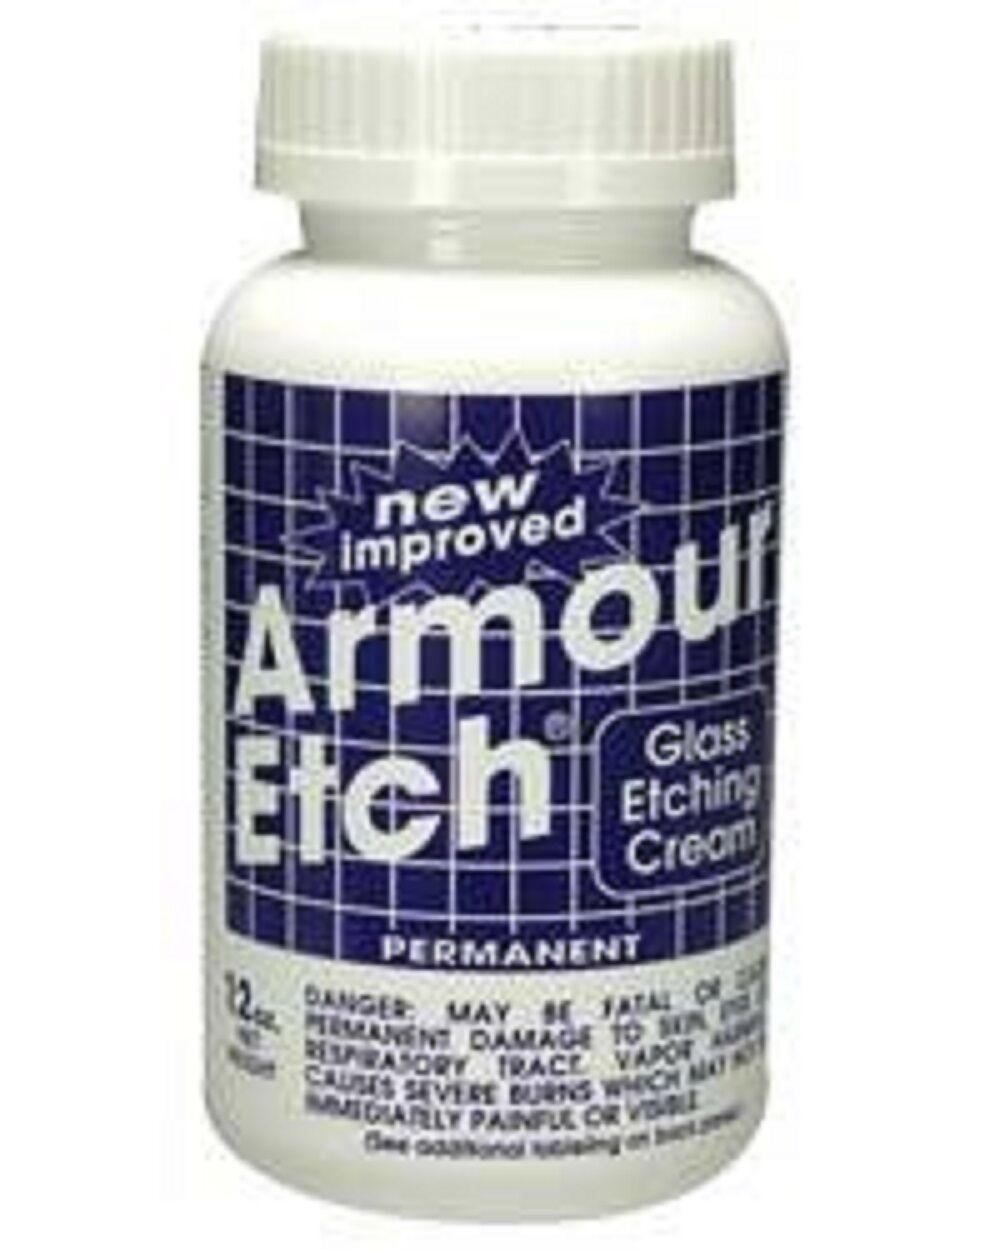 Armour Etch Glass Etching Cream - 10 oz  NEW